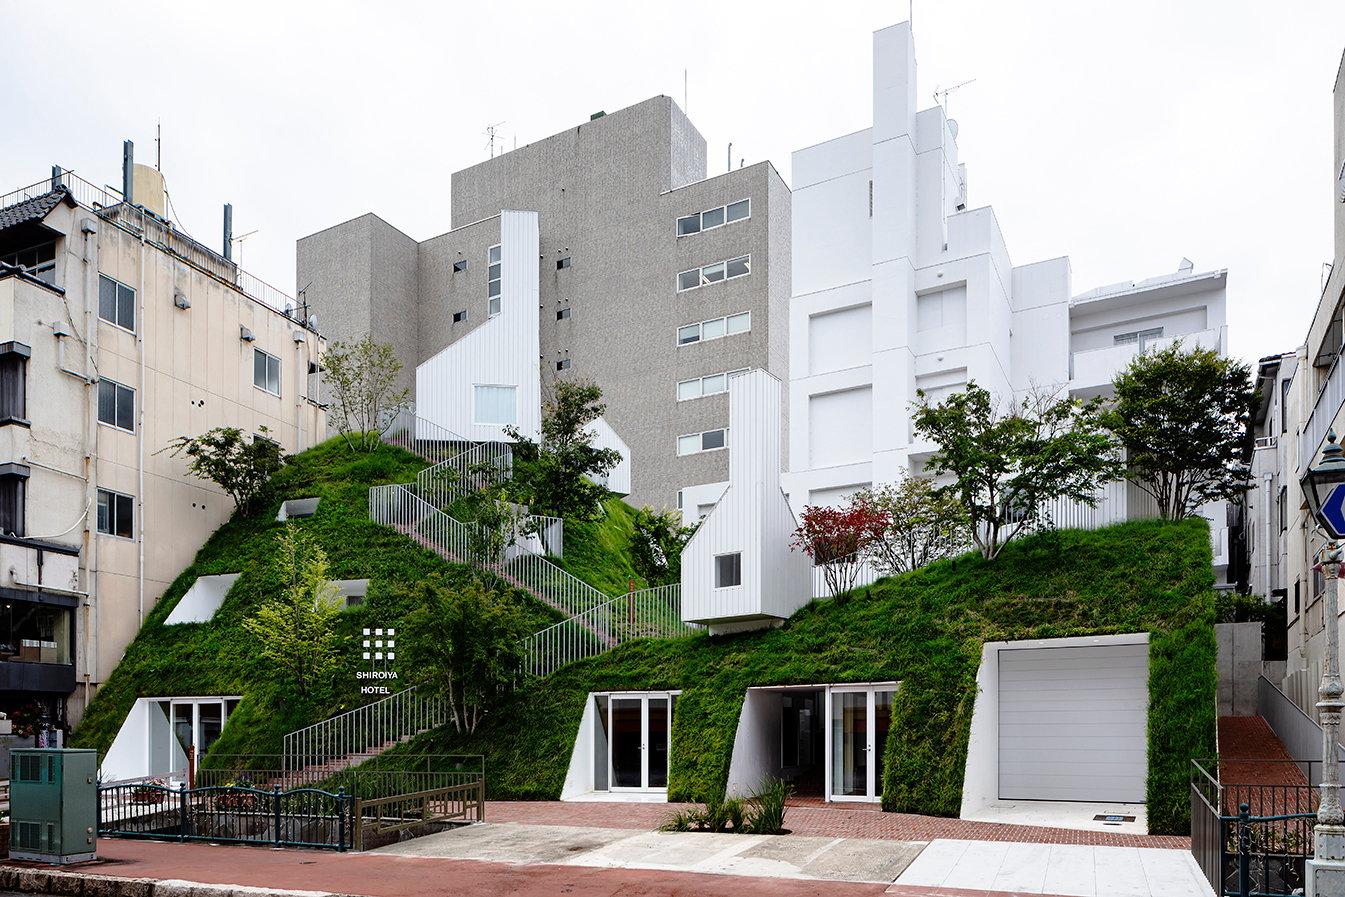 Sou Fujimoto Builds a Grassy Hillside in the City for ?Shiroiya Hotel?